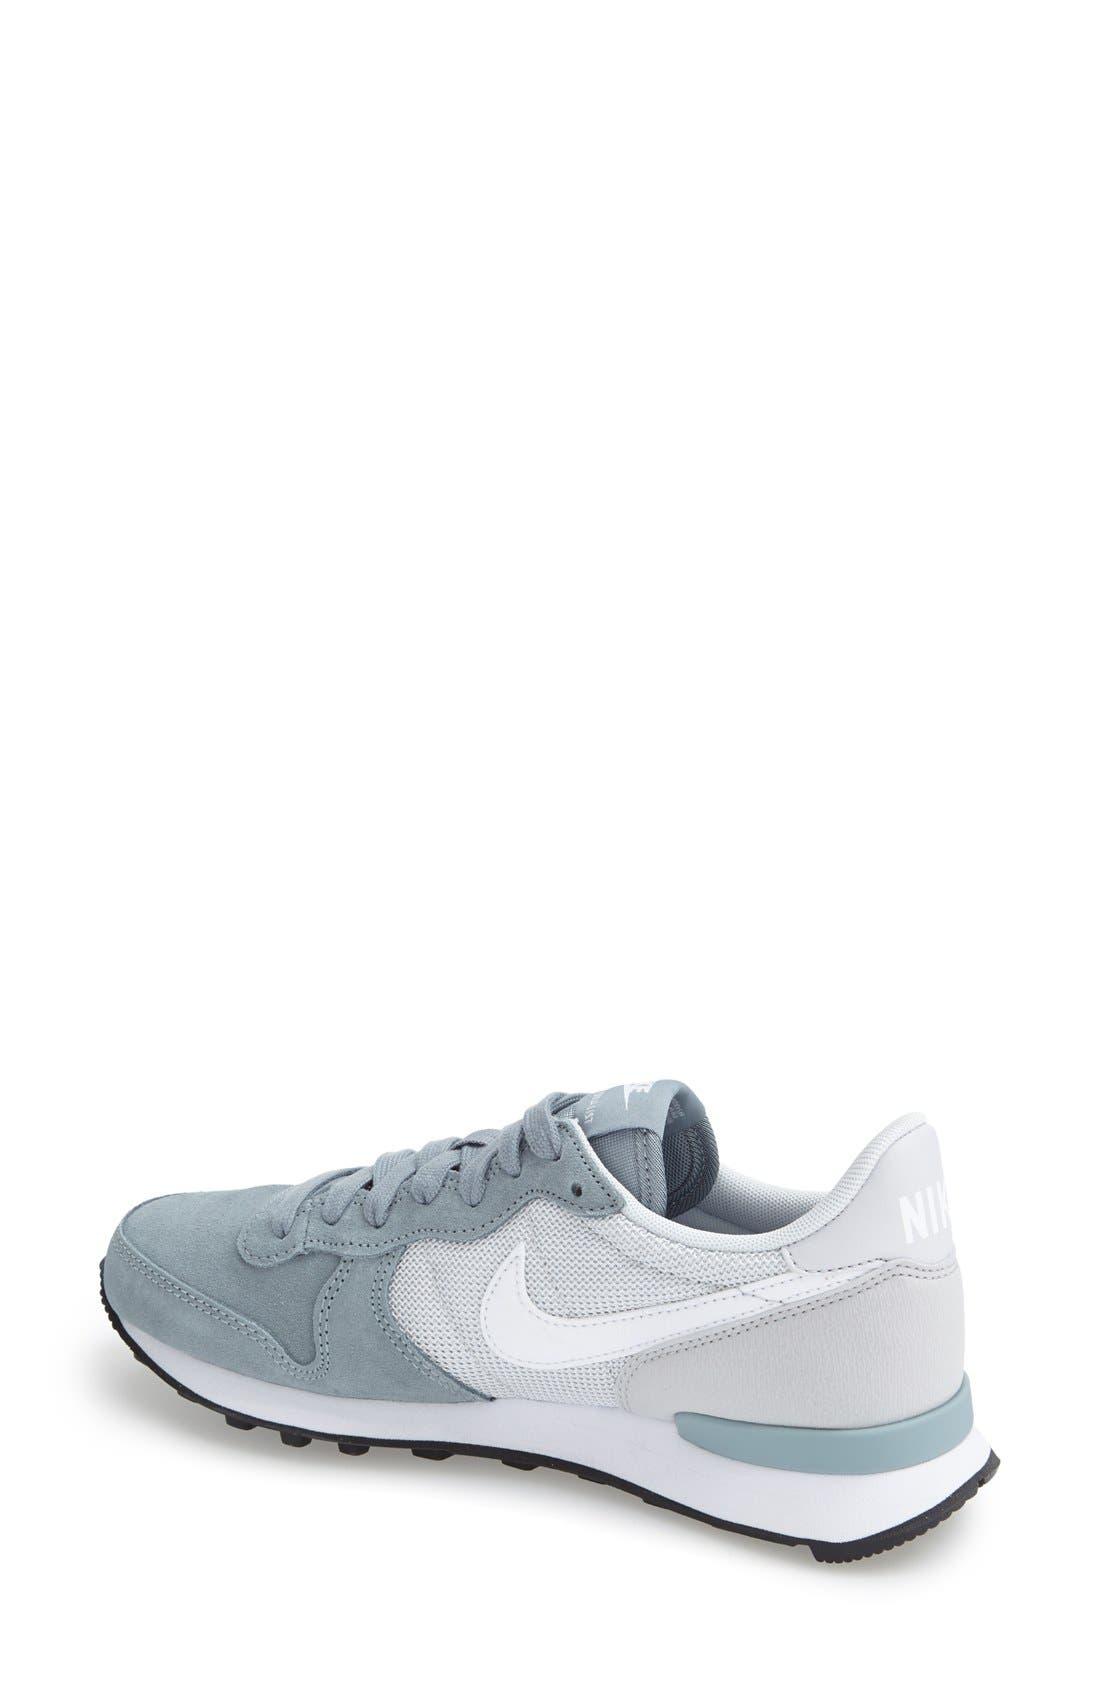 'Internationalist' Sneaker,                             Alternate thumbnail 2, color,                             Grey/ Platinum/ Black